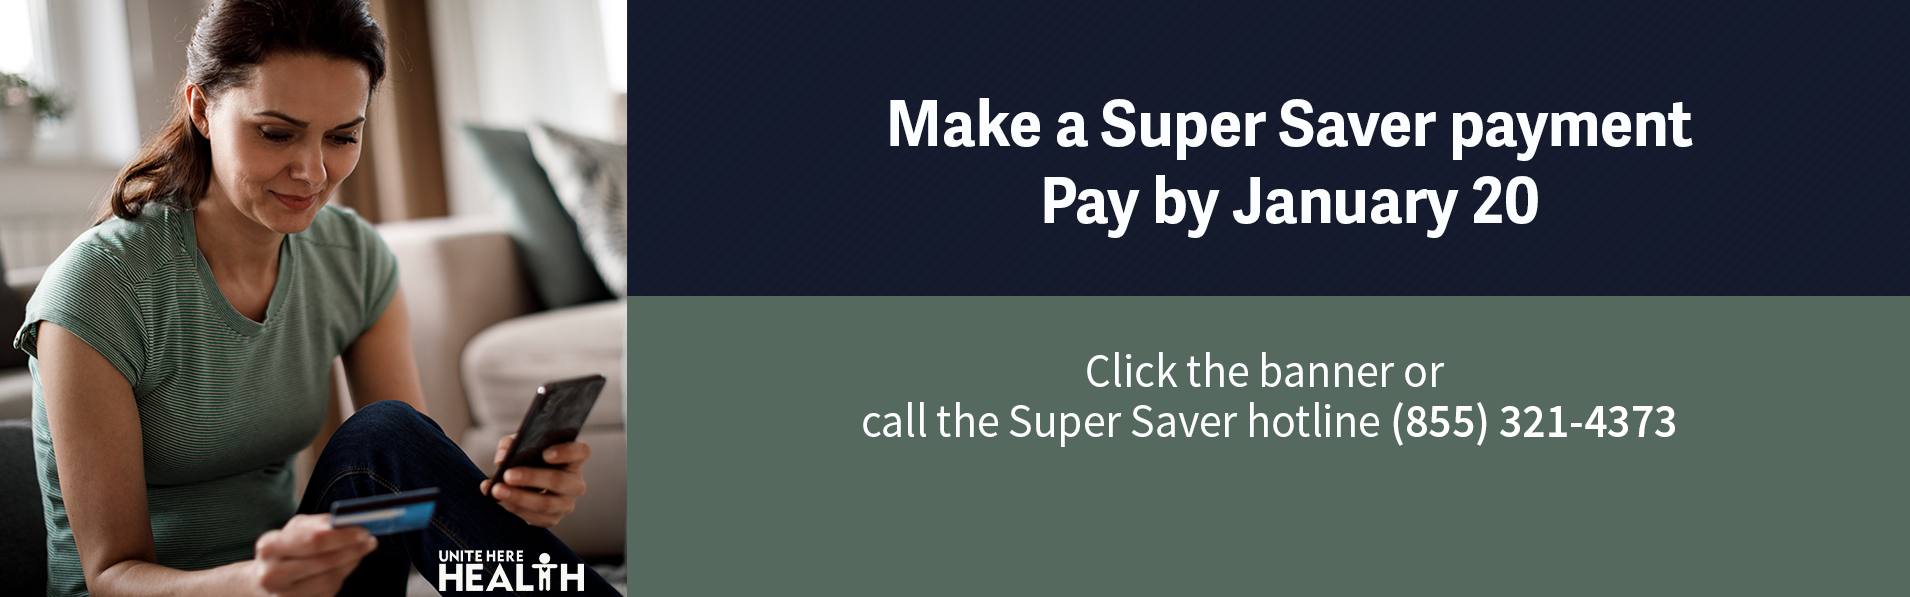 SuperSaver-Web-January